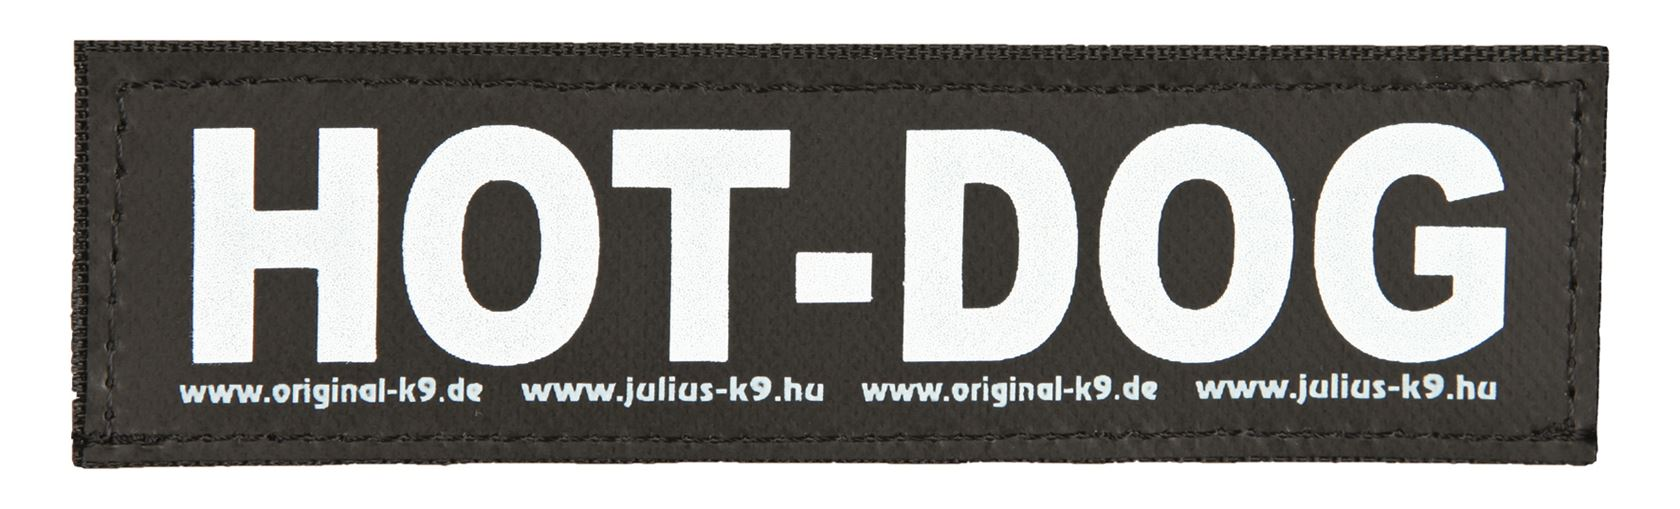 julius-k9 velcro sticker small hot dog (2sts)